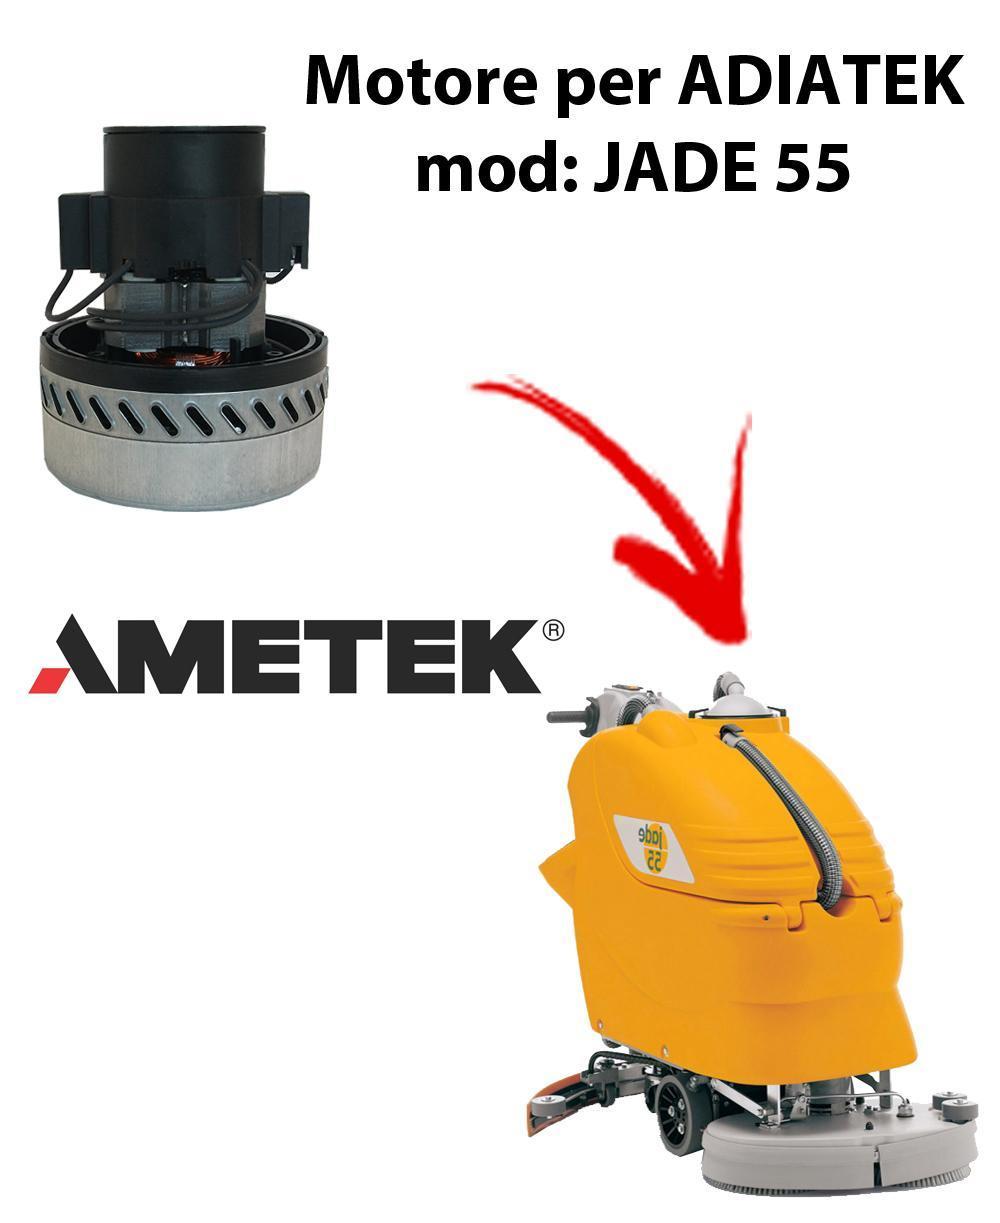 Jade 55 Motore de aspiración Ametek Italia  para fregadora Adiatek